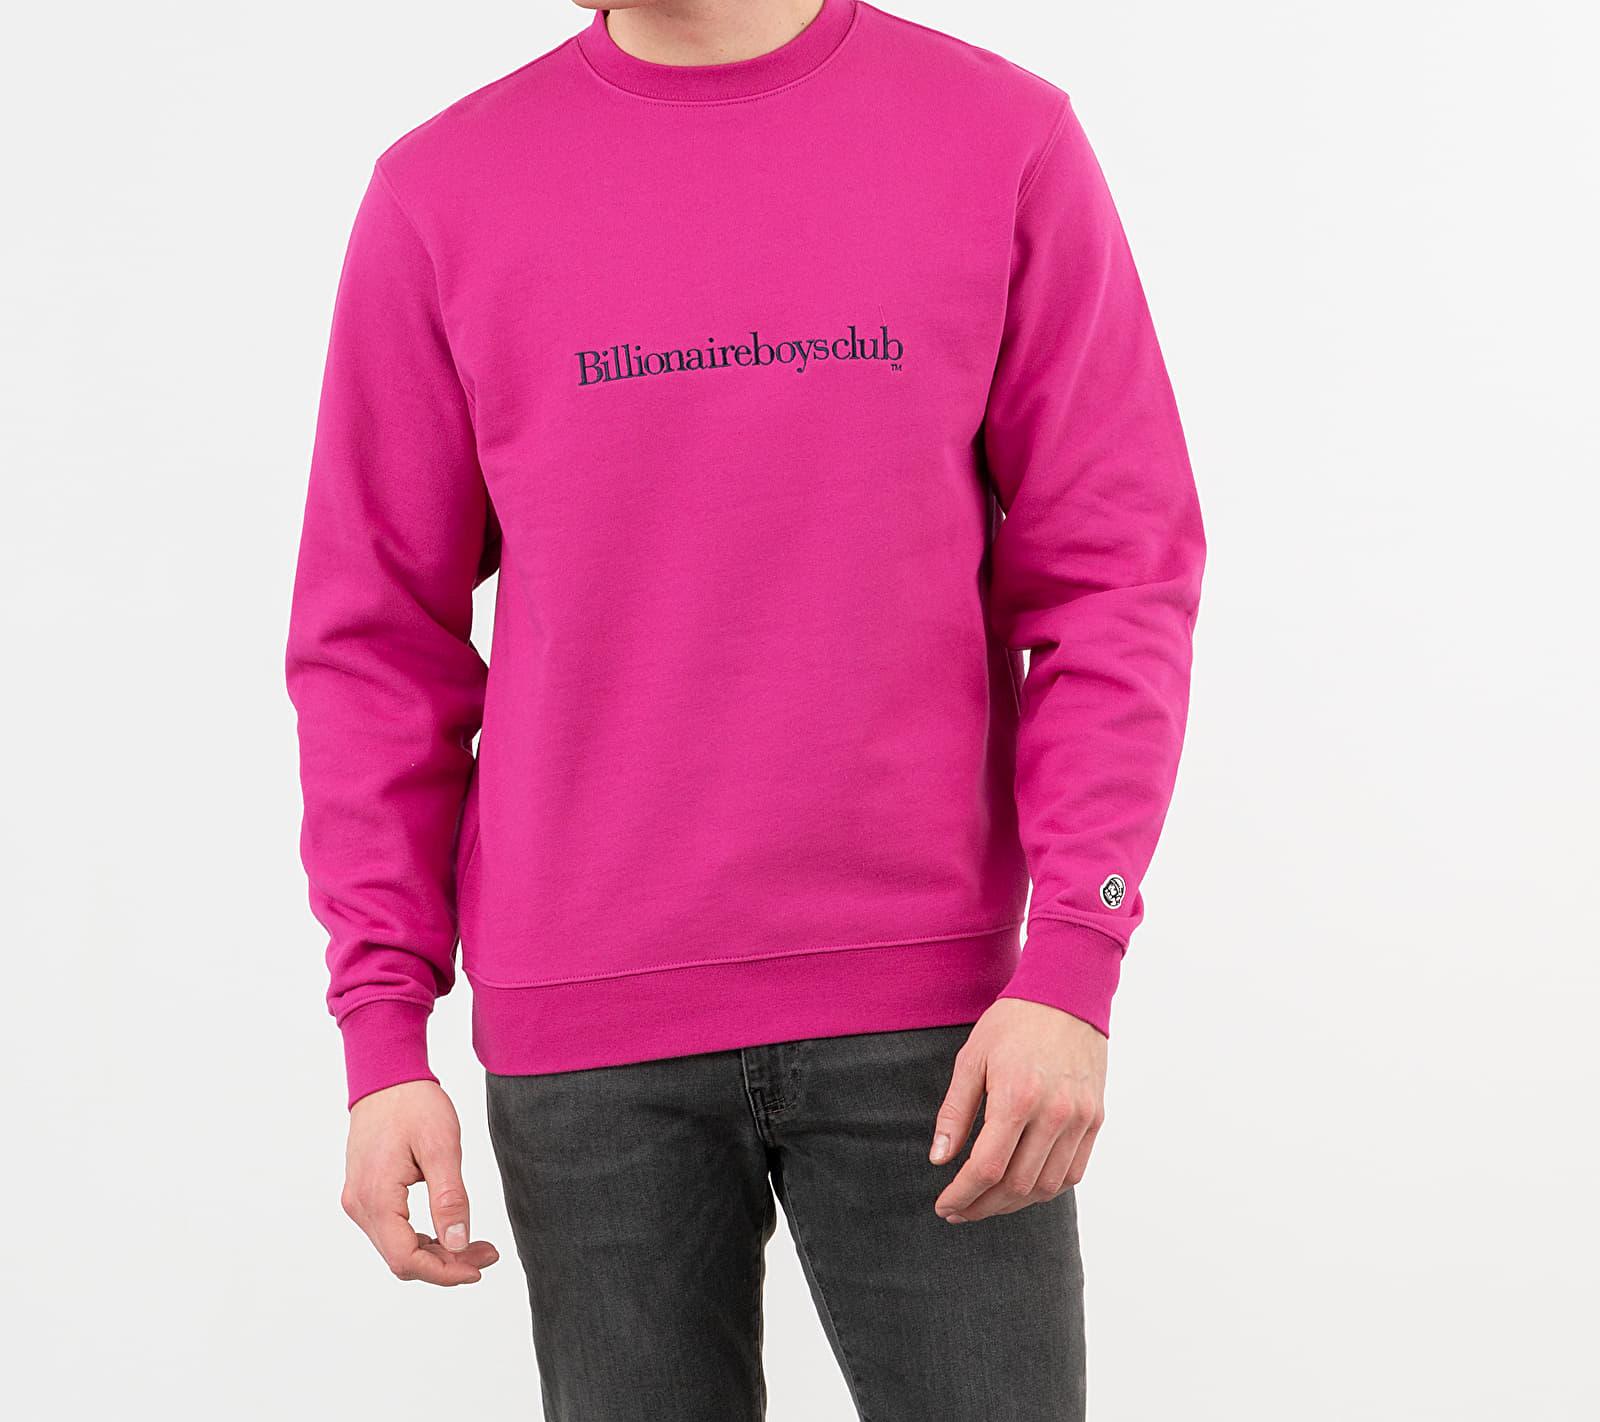 Billionaire Boys Club Embroidered Logo Crewneck Pink